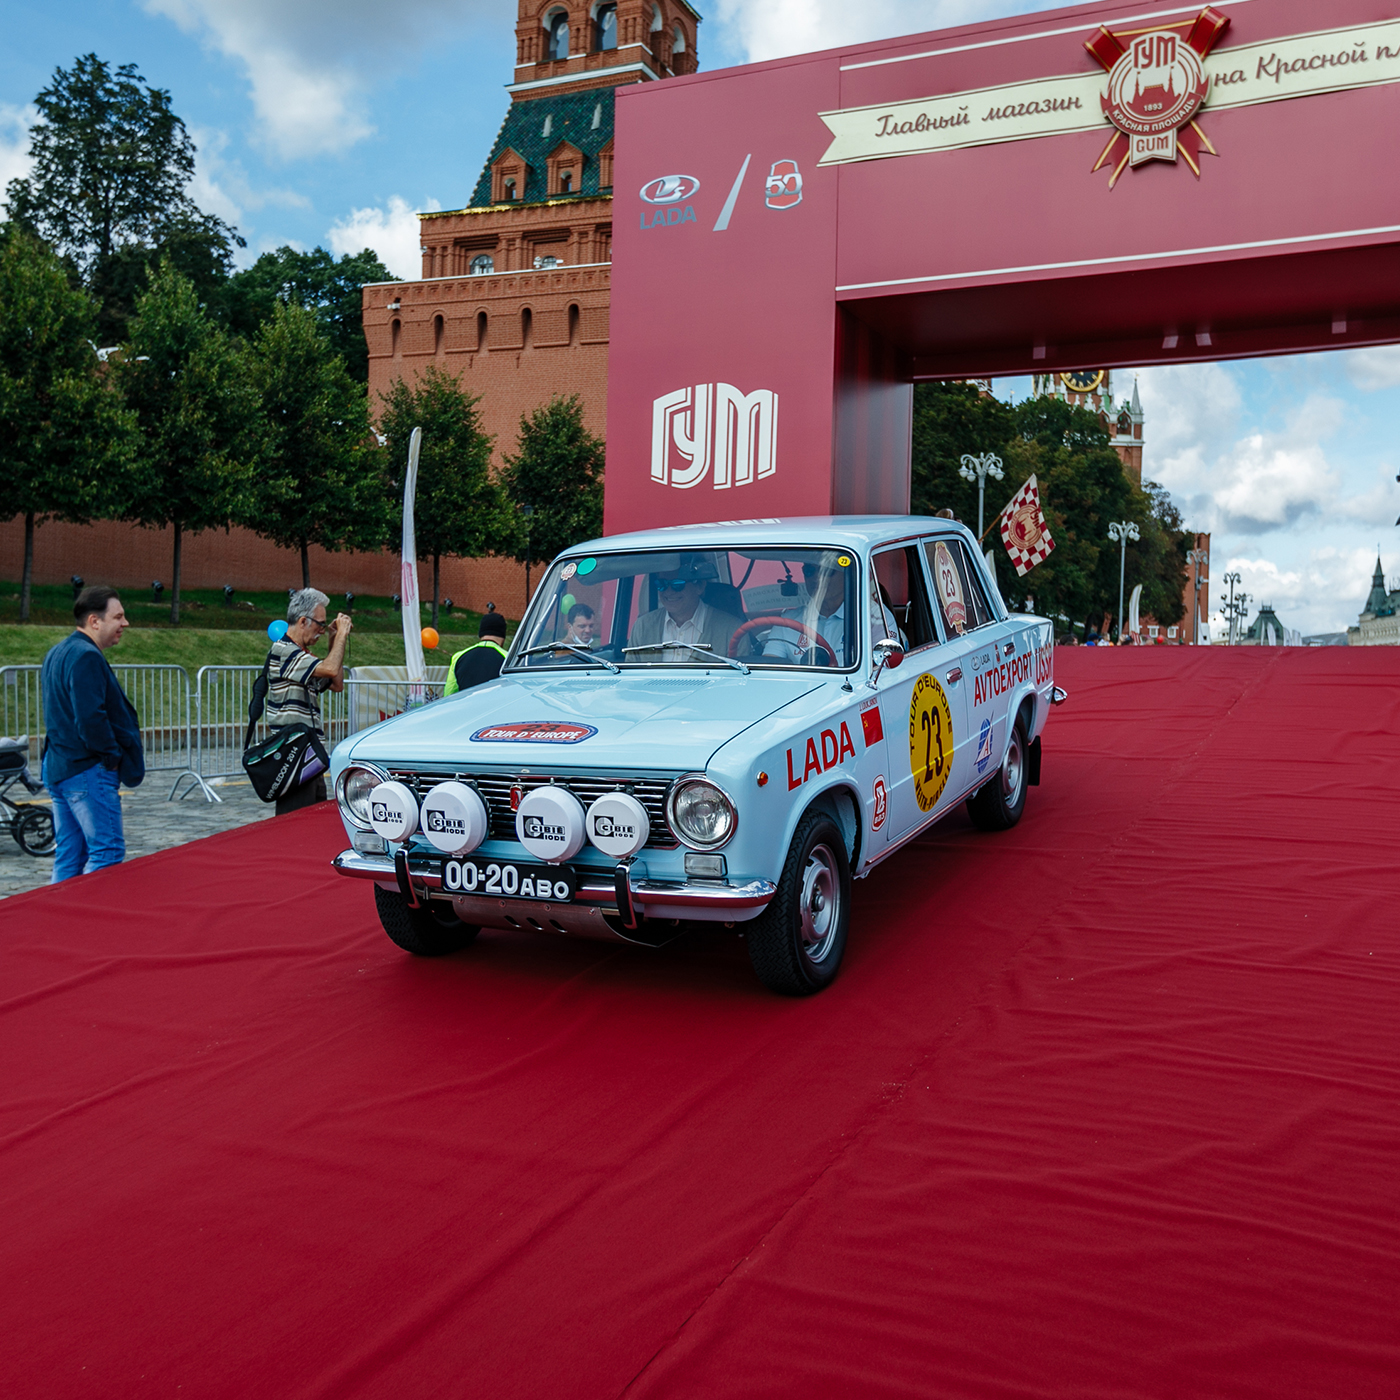 Lada parada 50 de ani la Moscova (6)